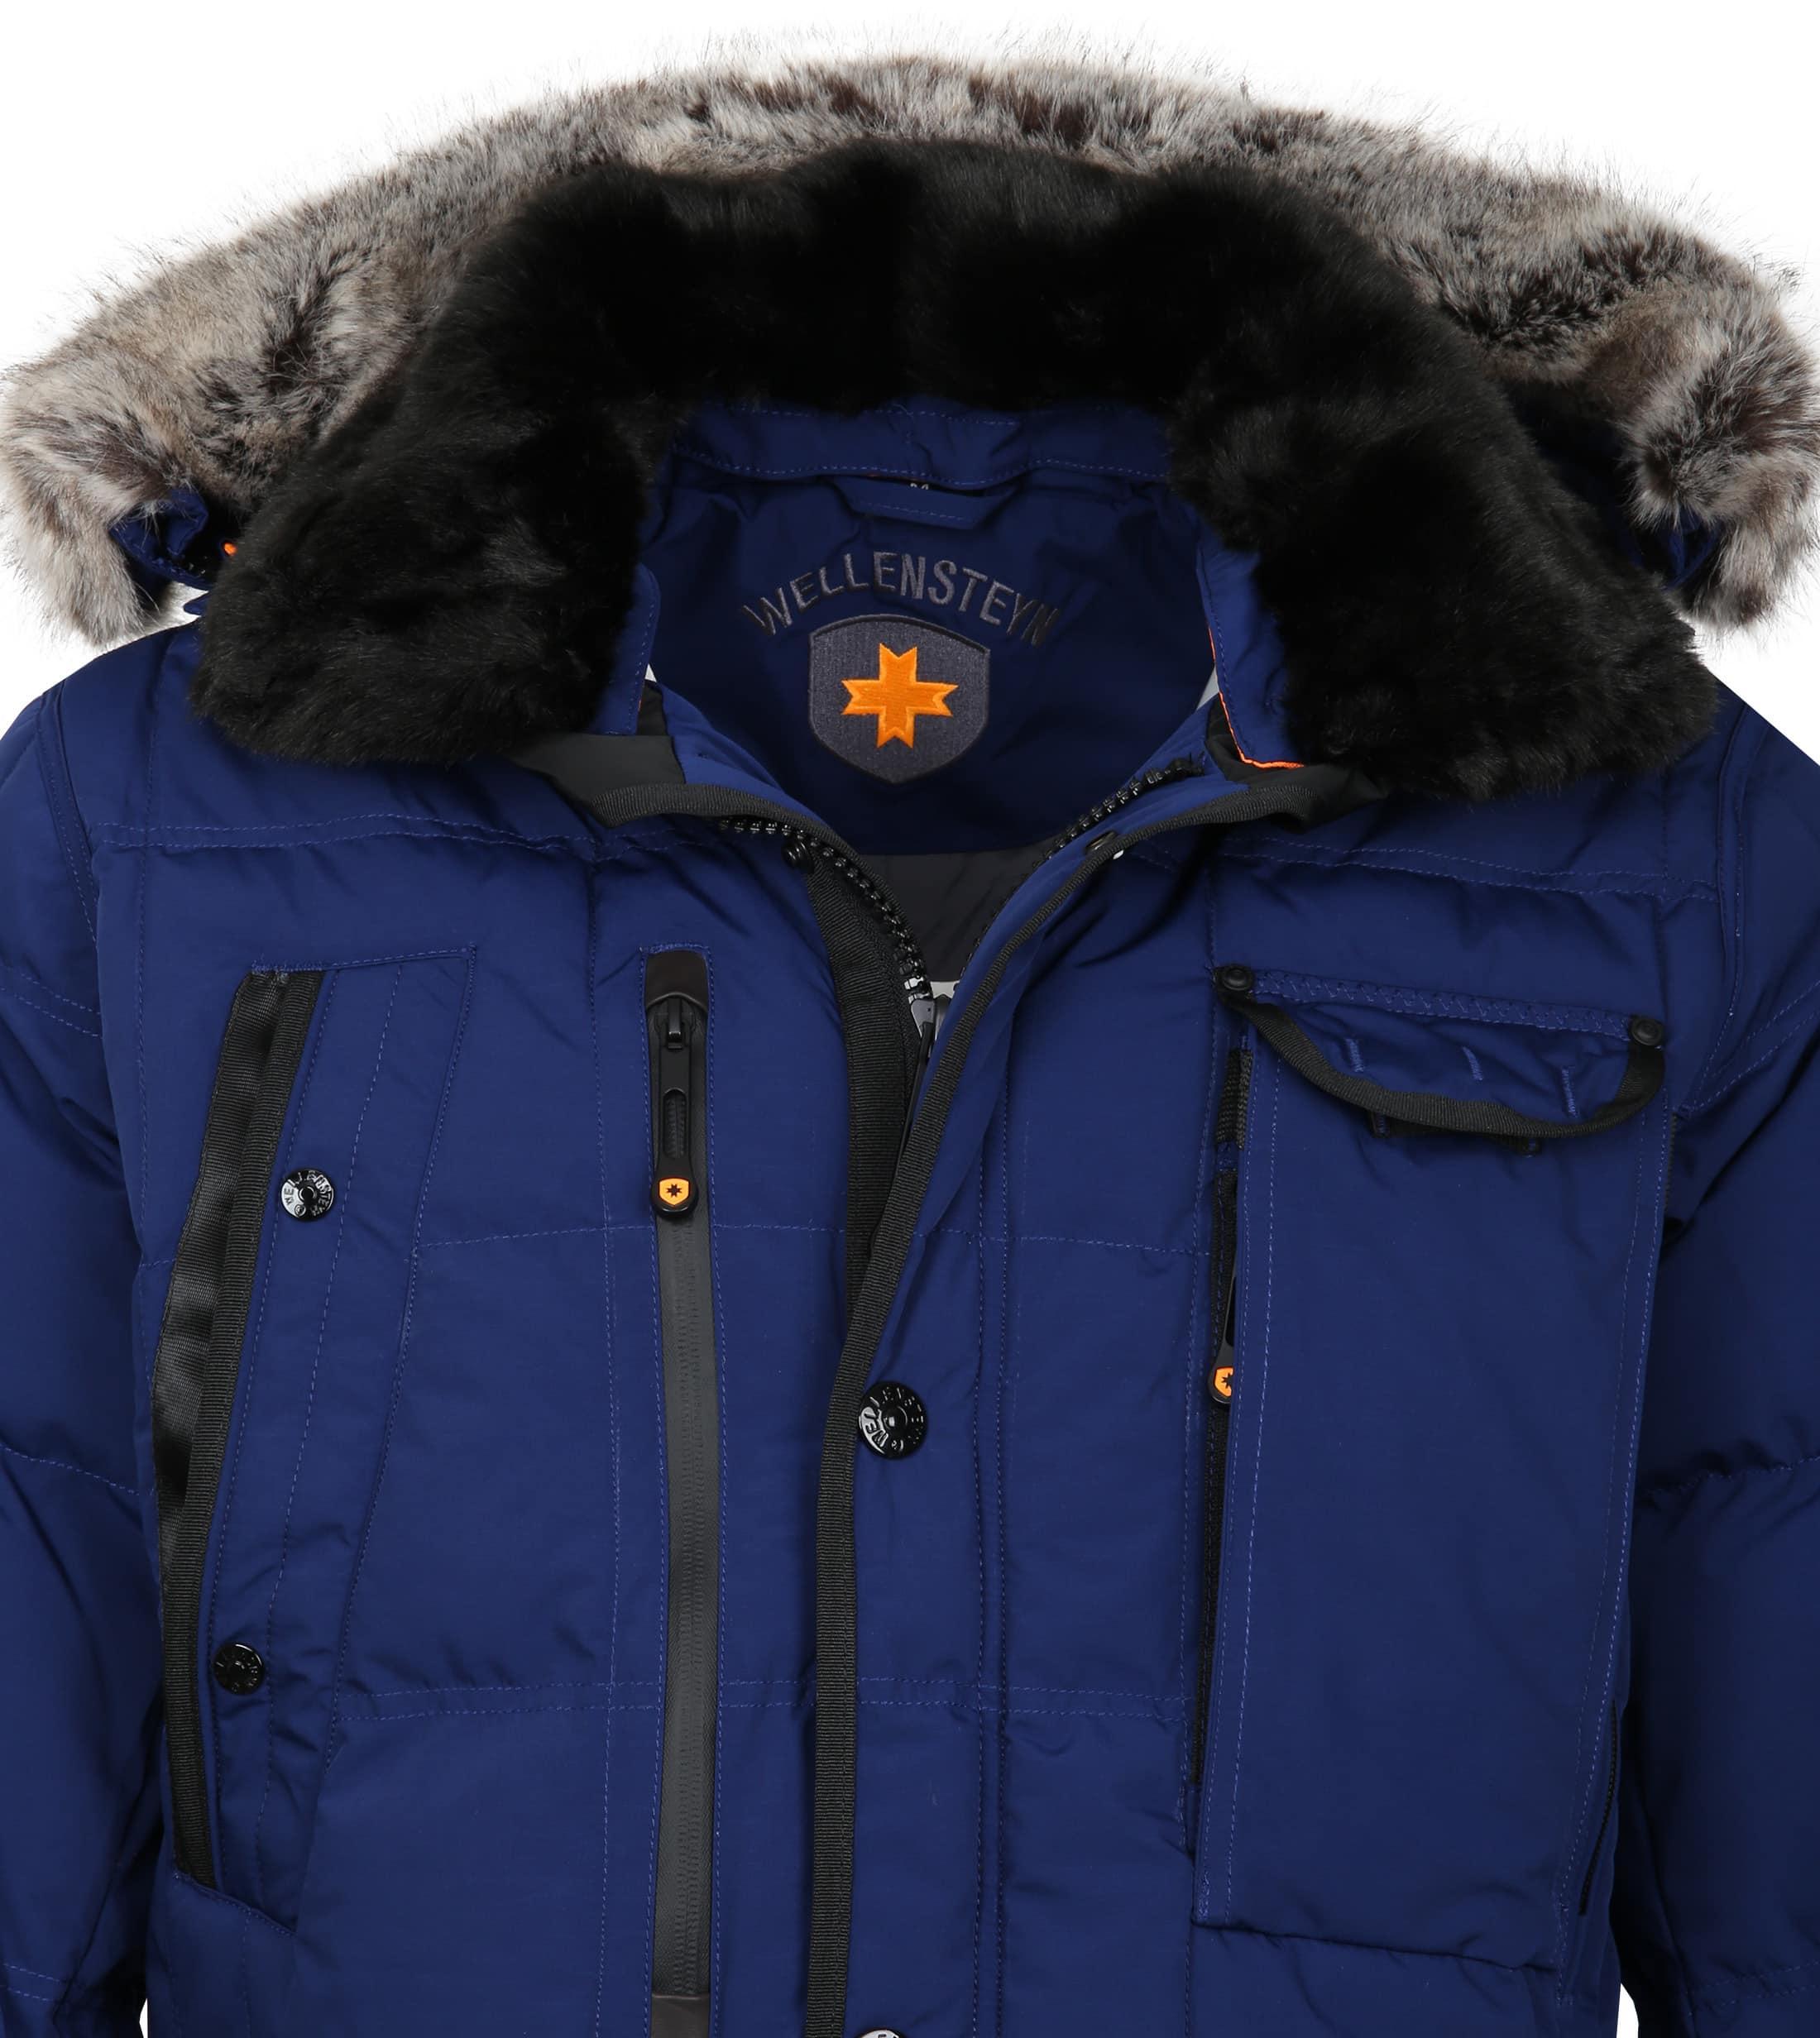 Wellensteyn Marvelous Jacket Blue foto 1